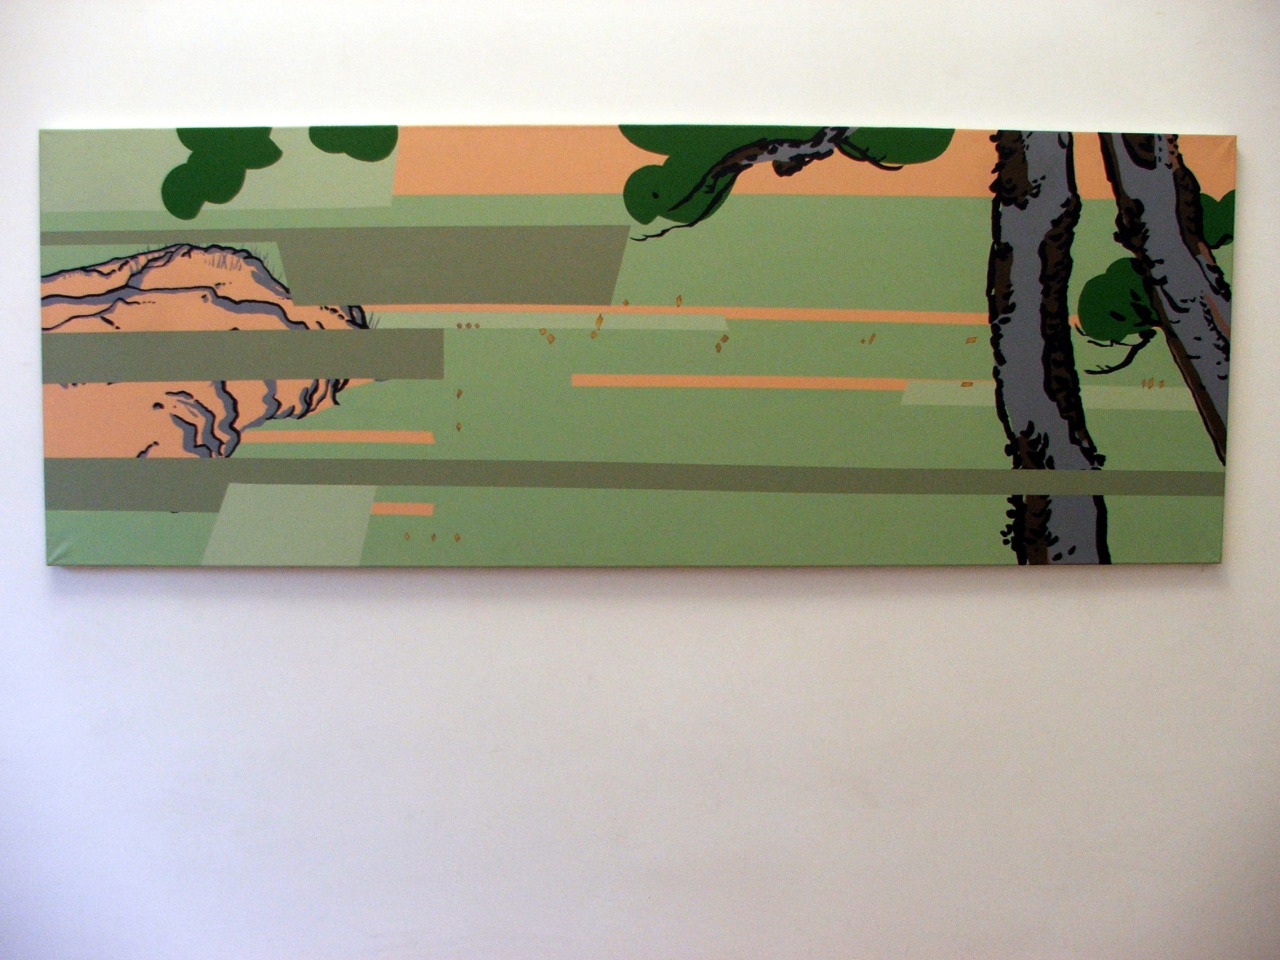 untitled, 2005, acrylic on canvas, 198x72cm